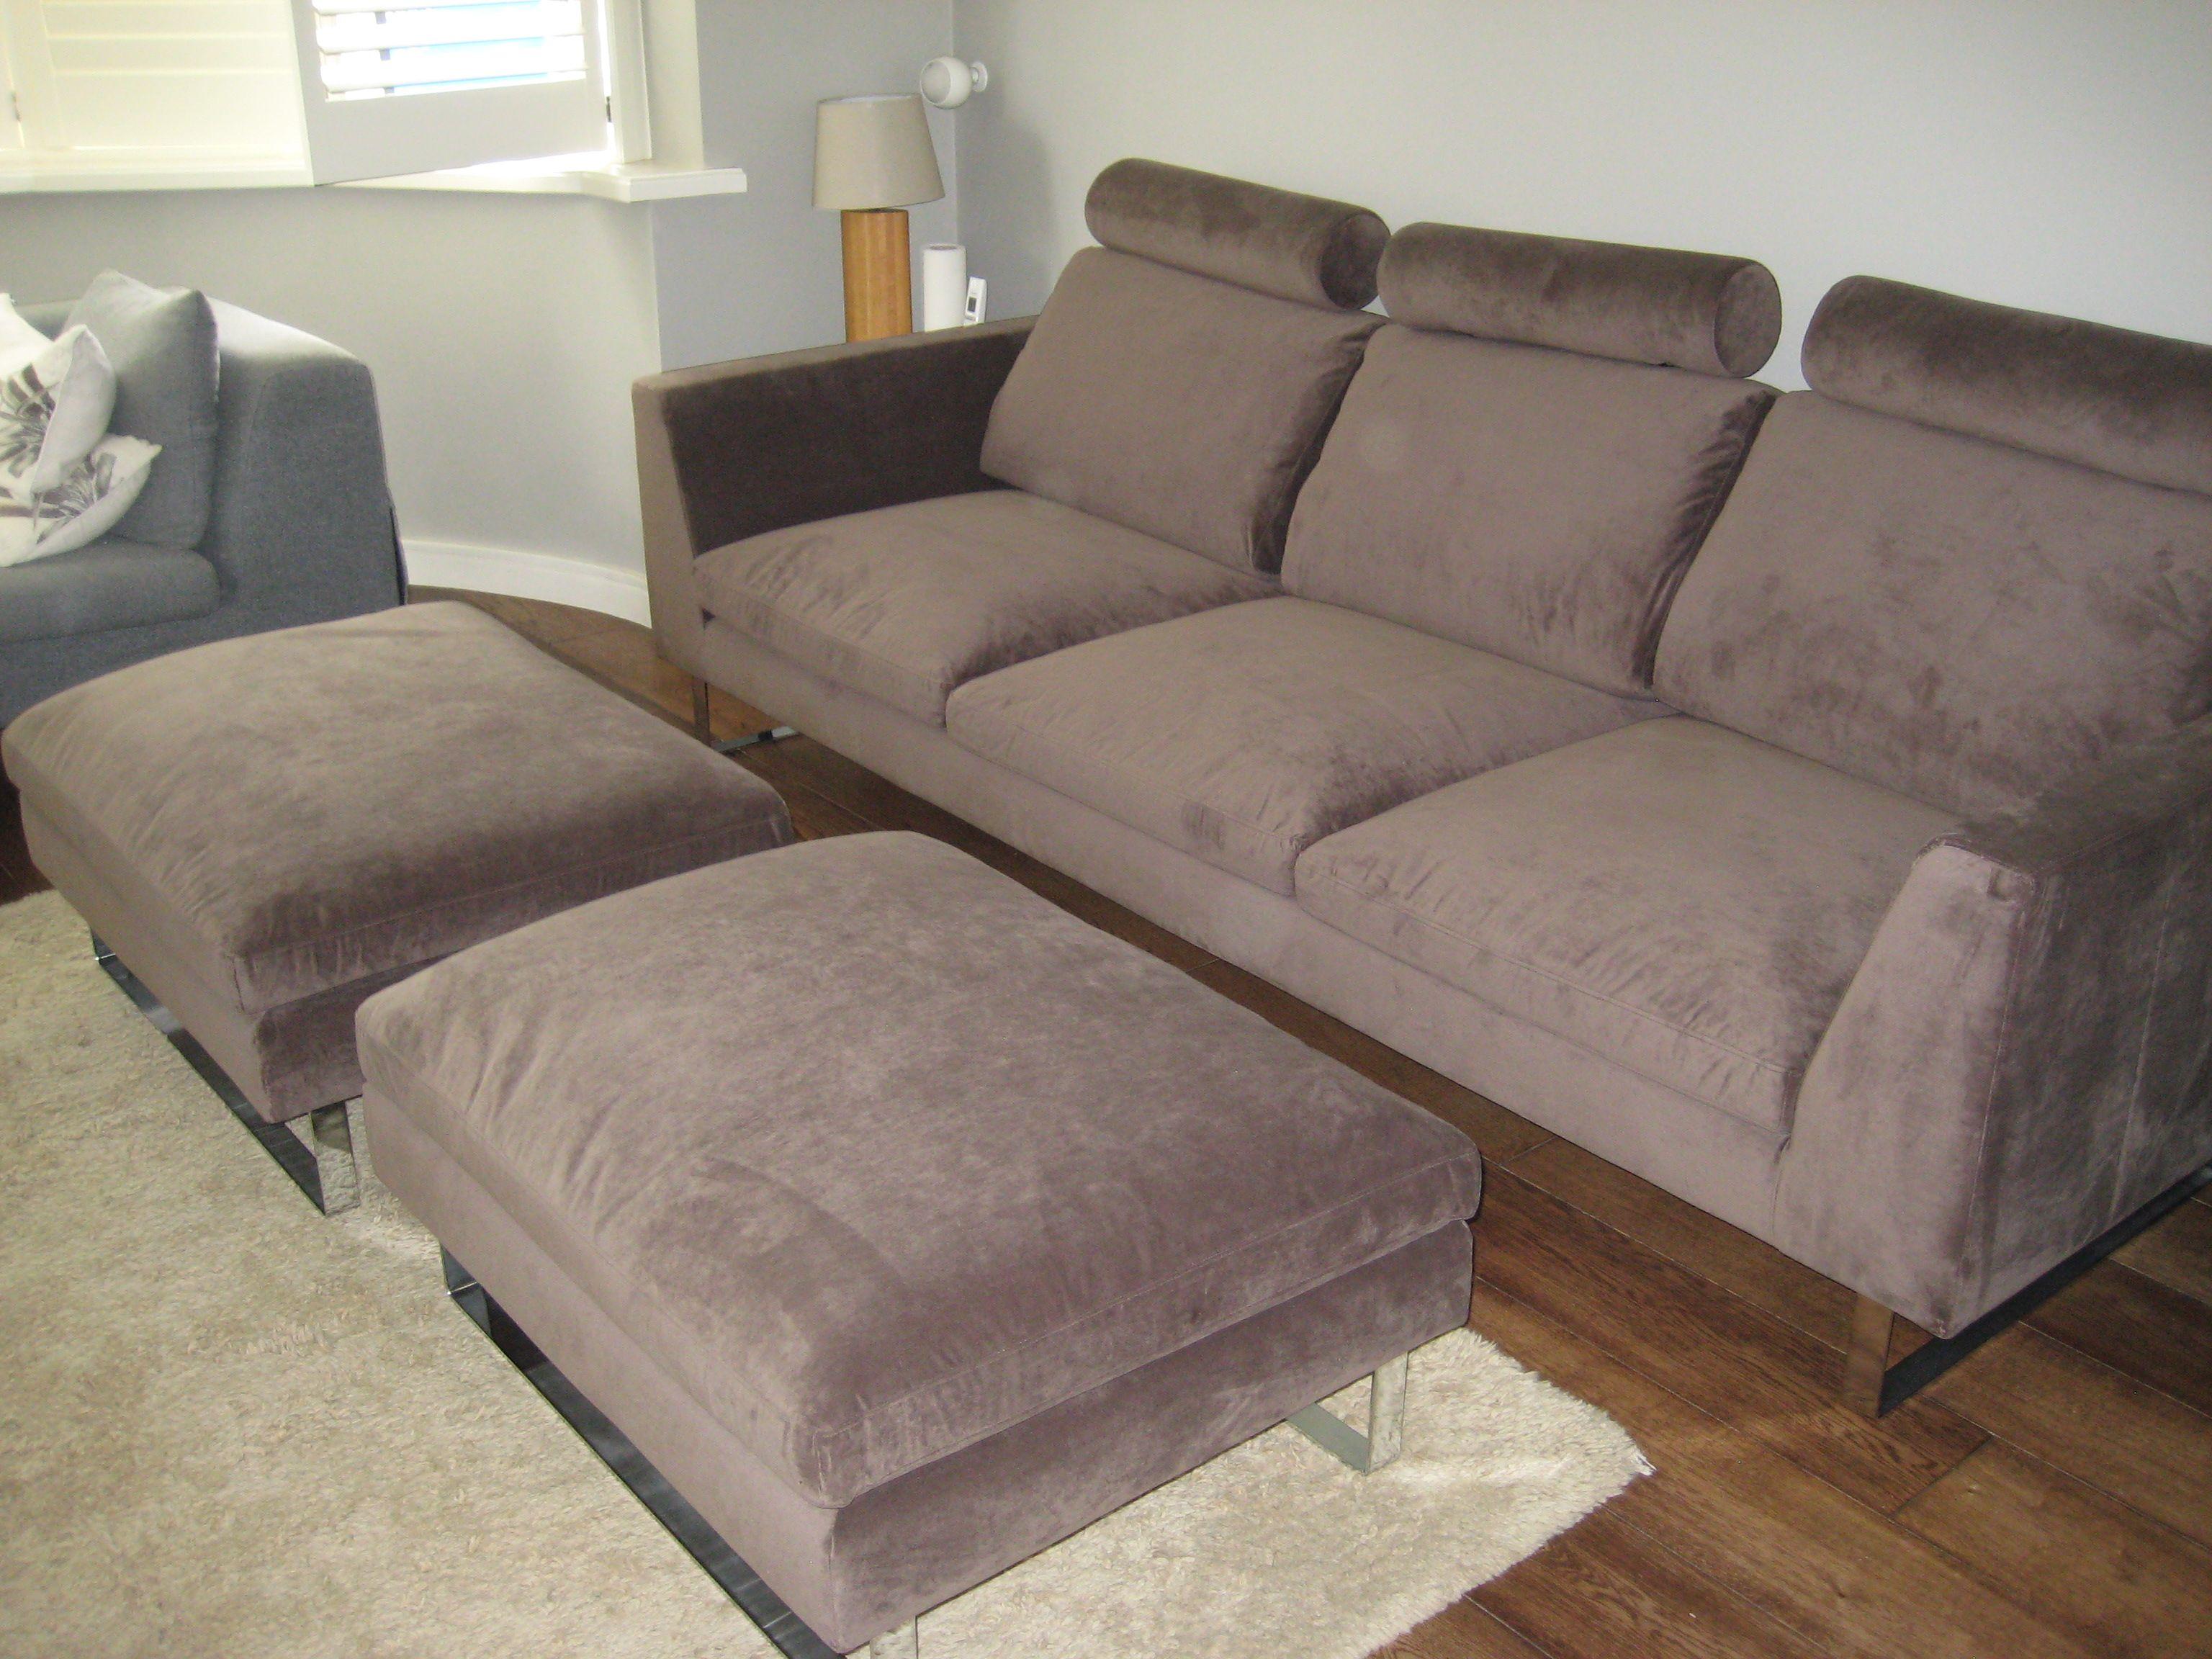 sofa 250cm cheap corner garden furniture 3 seat 250 cm wide x 102 deep with 2 footstools each 70